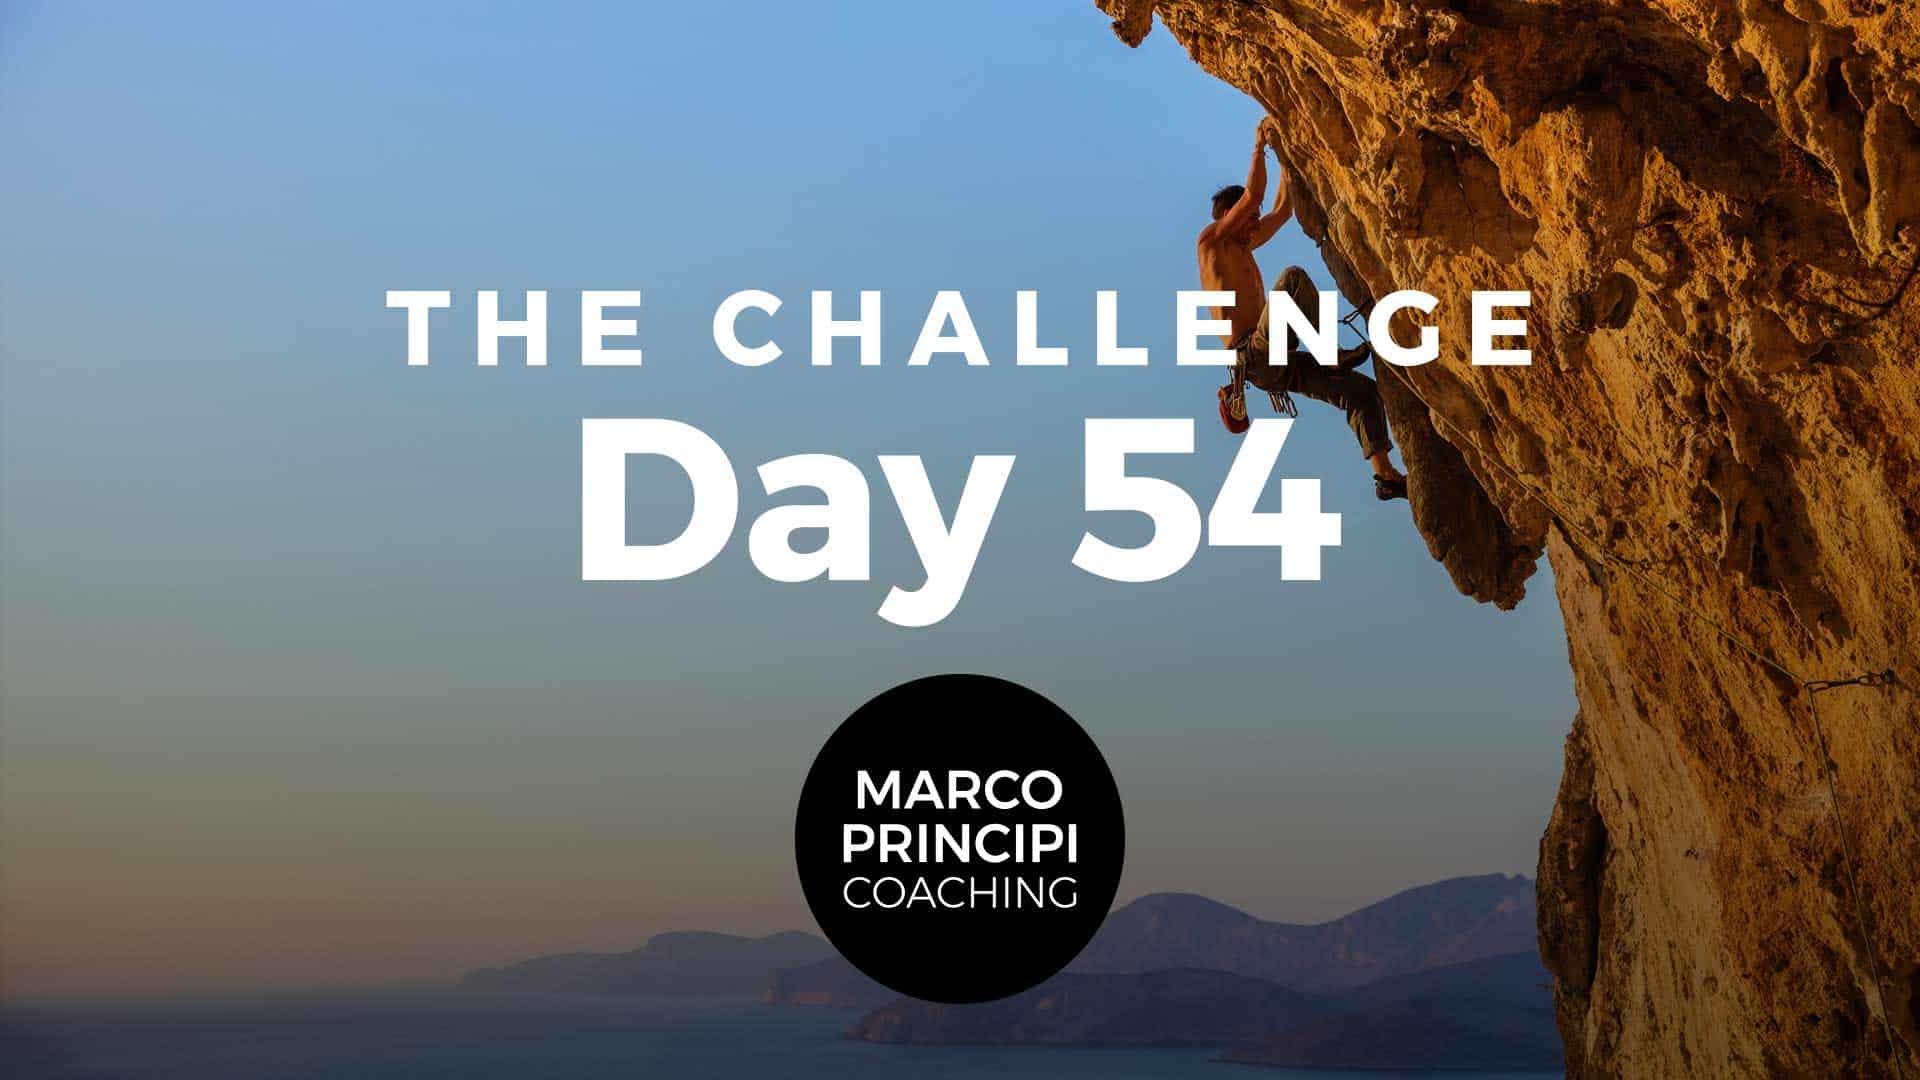 Marco Principi The Challenge Day 54